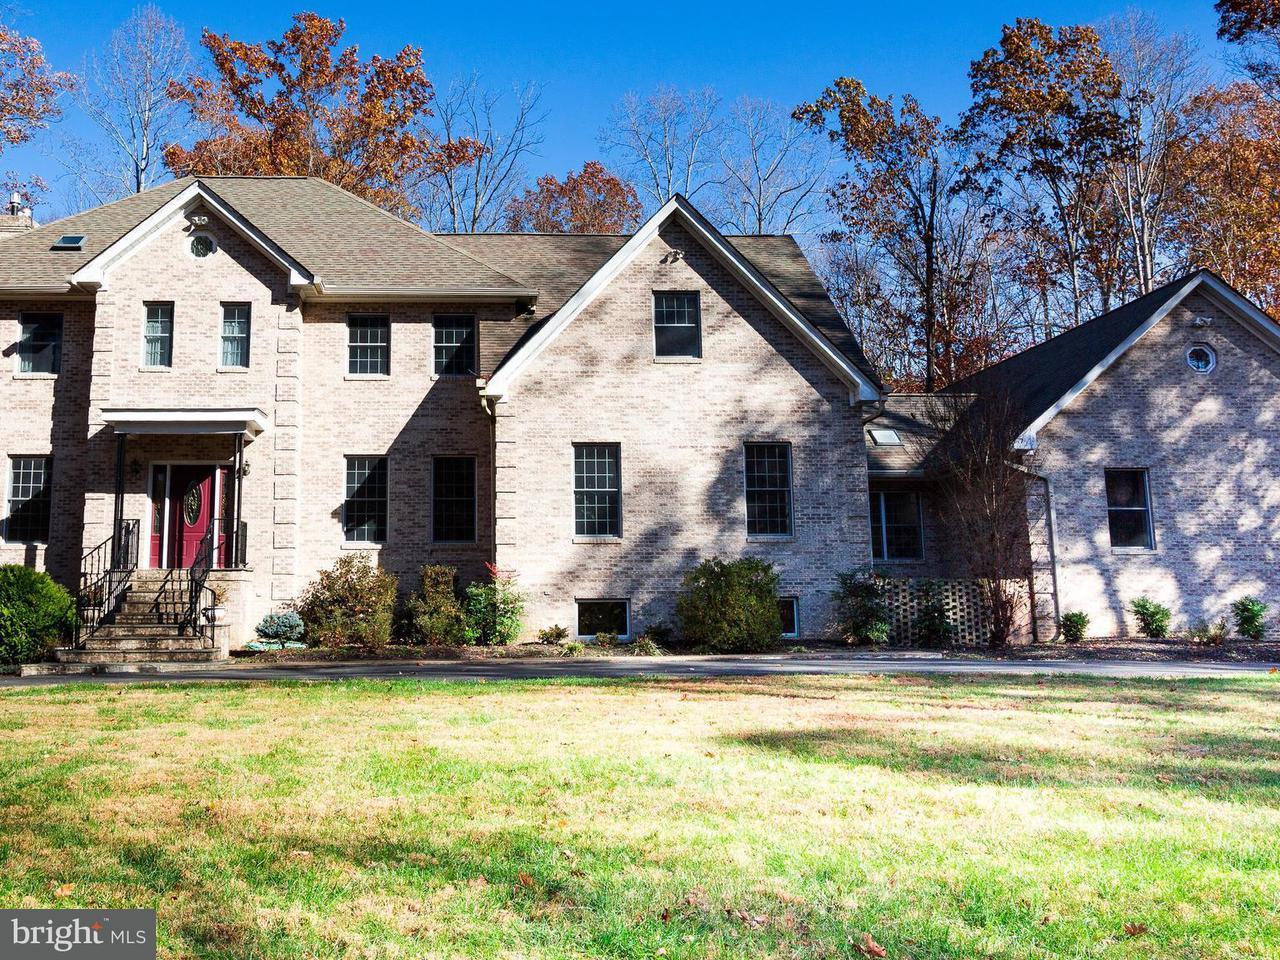 獨棟家庭住宅 為 出售 在 16 Winning Colors Road 16 Winning Colors Road Stafford, 弗吉尼亞州 22556 美國